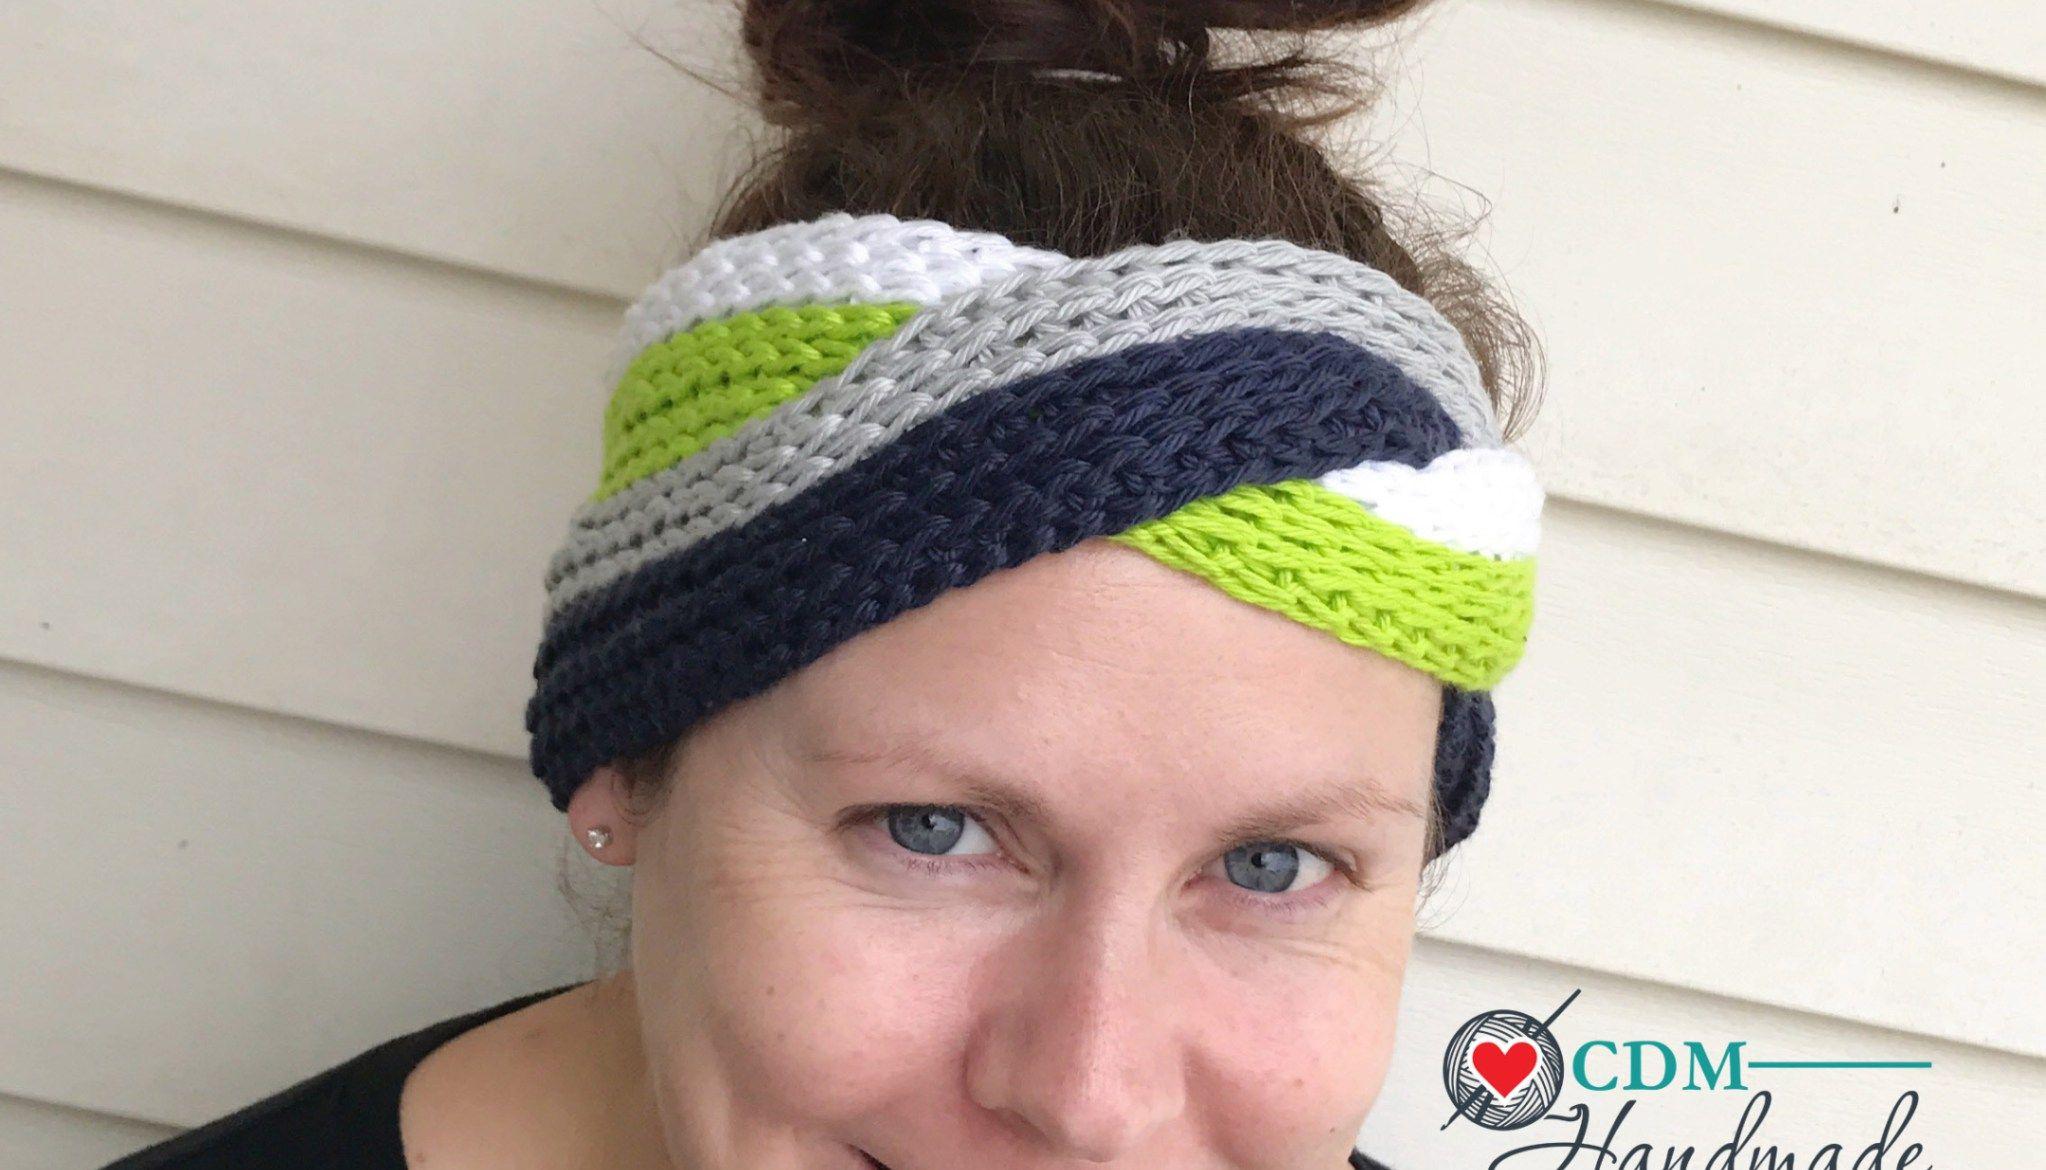 Interlocking Knit Look Headband - a FREE Crochet Pattern and Video ...